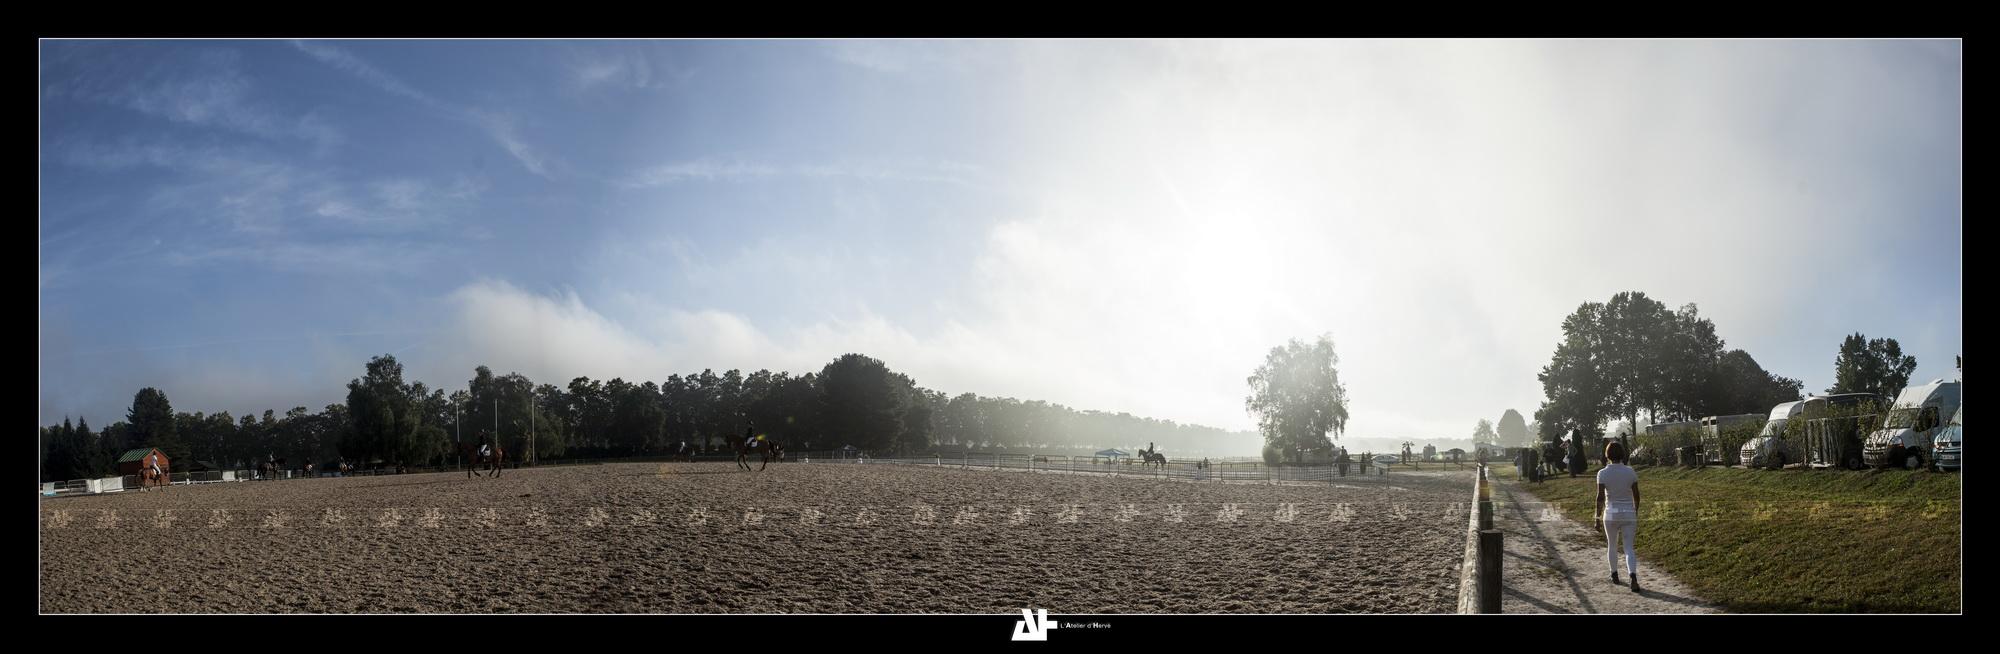 Panorama sans titre1_redimensionner